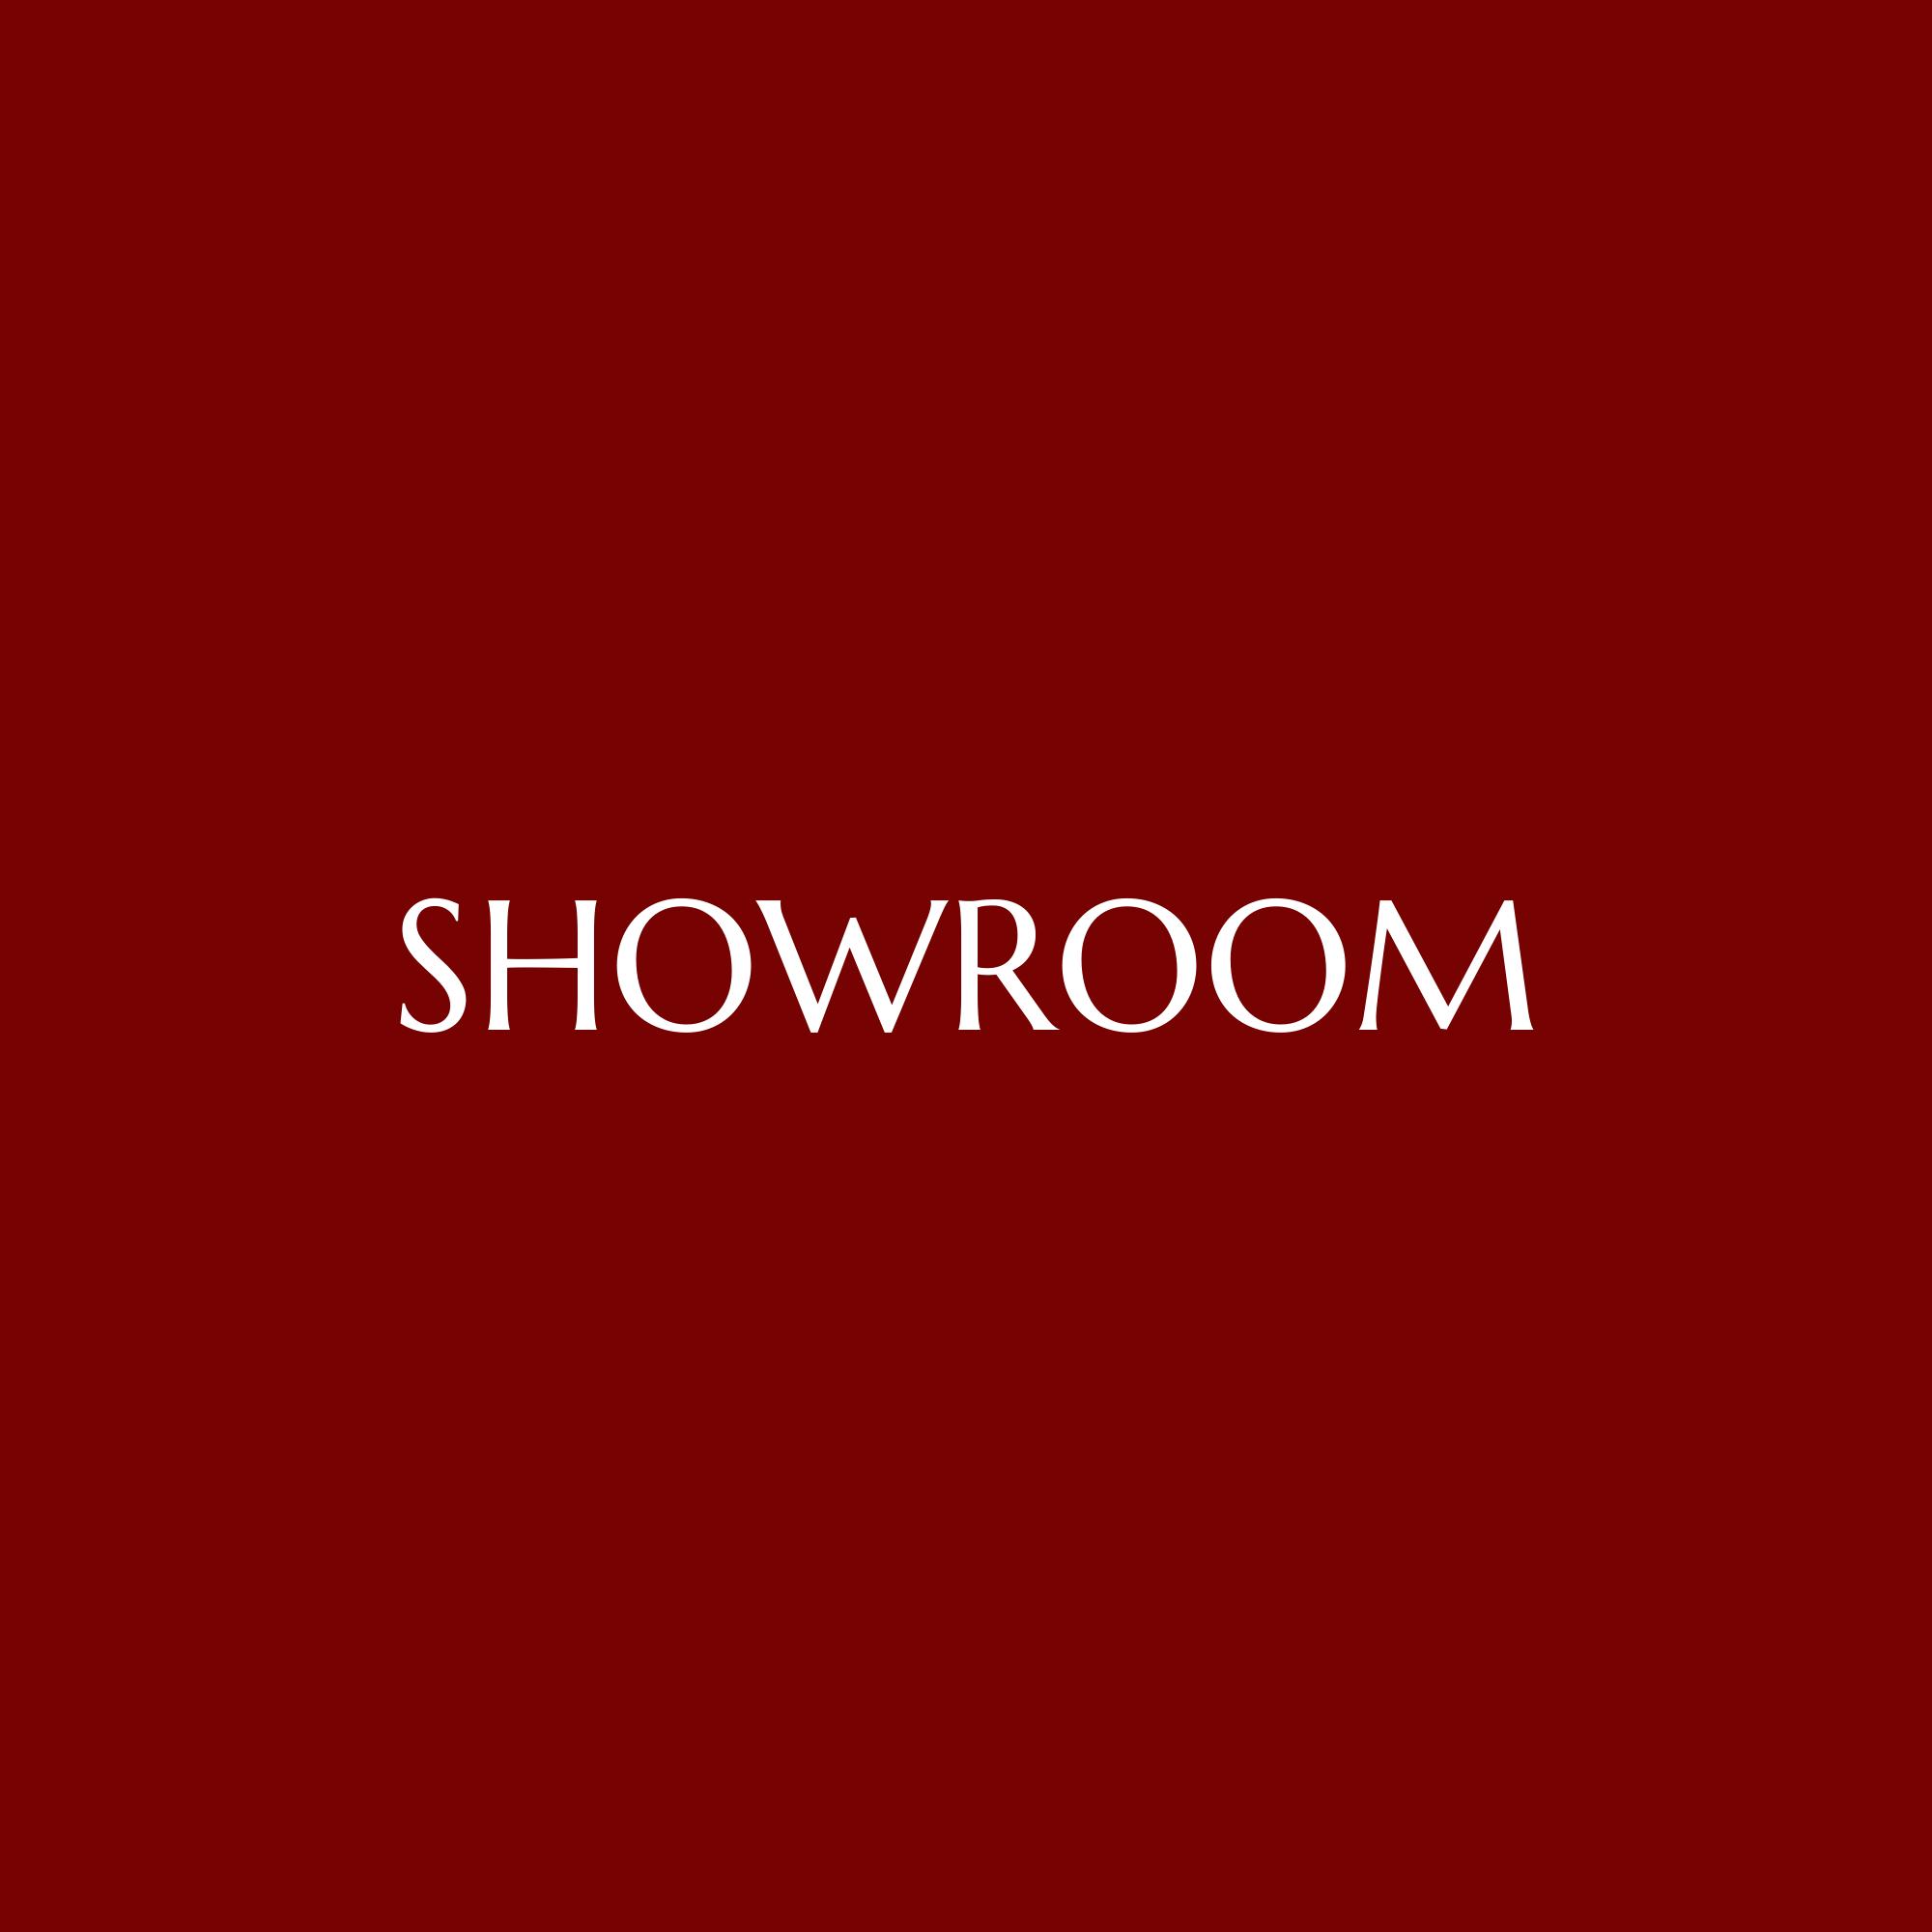 Showroom Oriental Lamp Shade